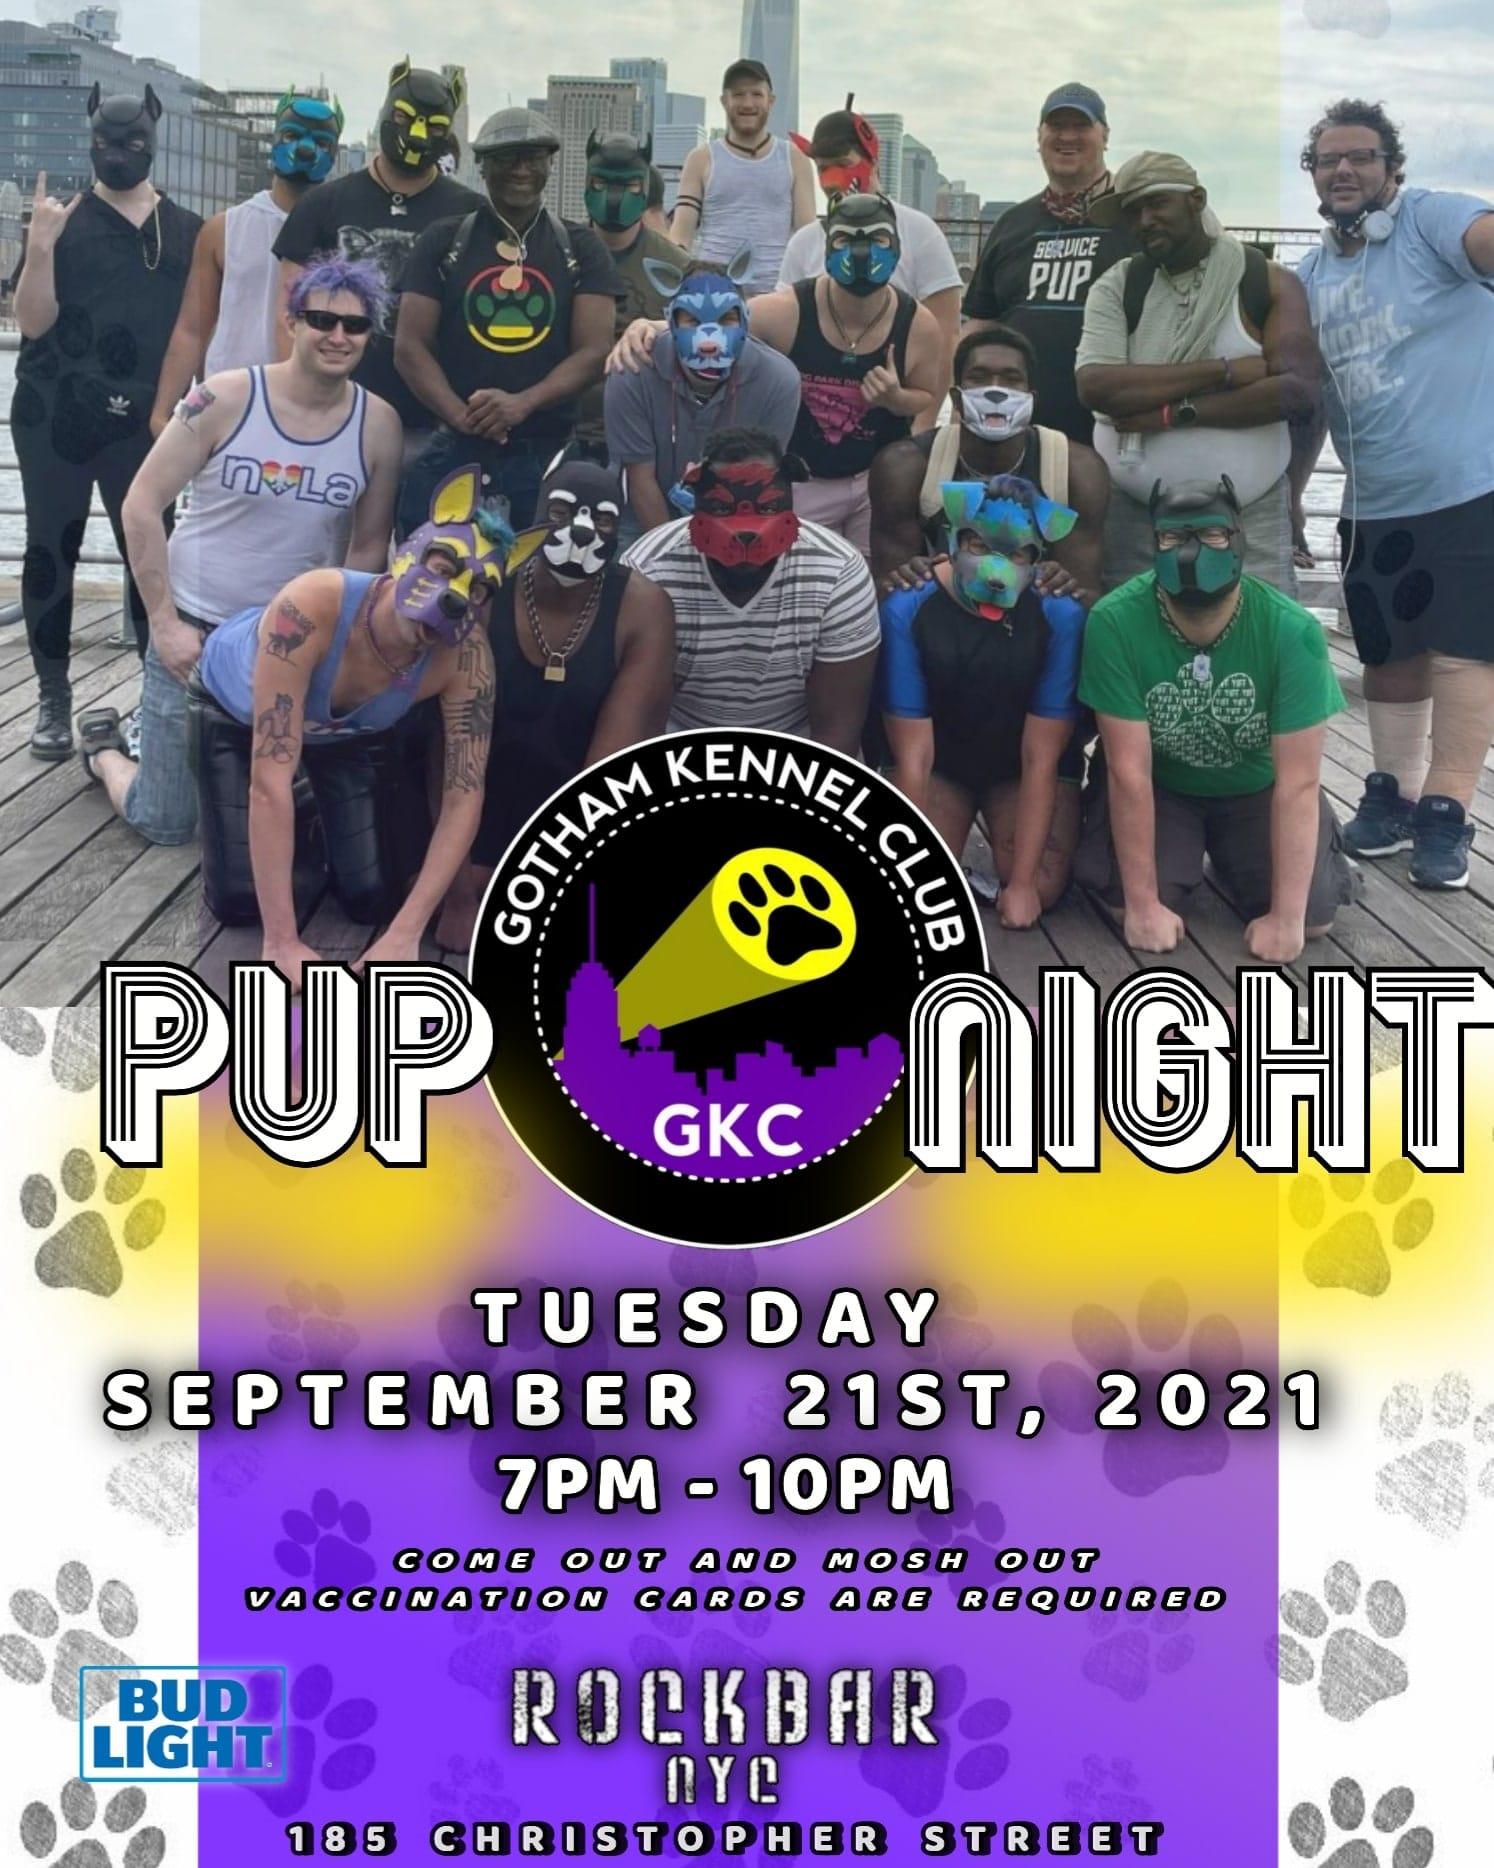 2021-09-21 - Pup Night